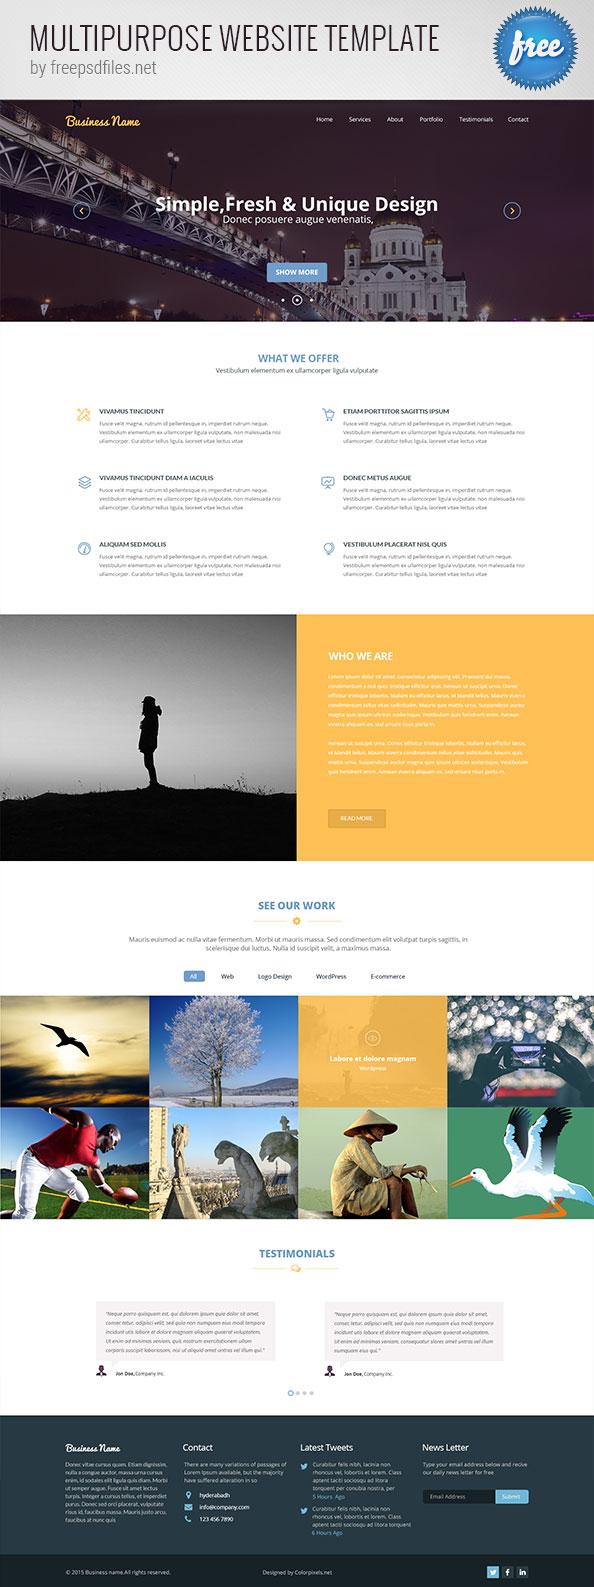 Free PSD Multipurpose Website Template